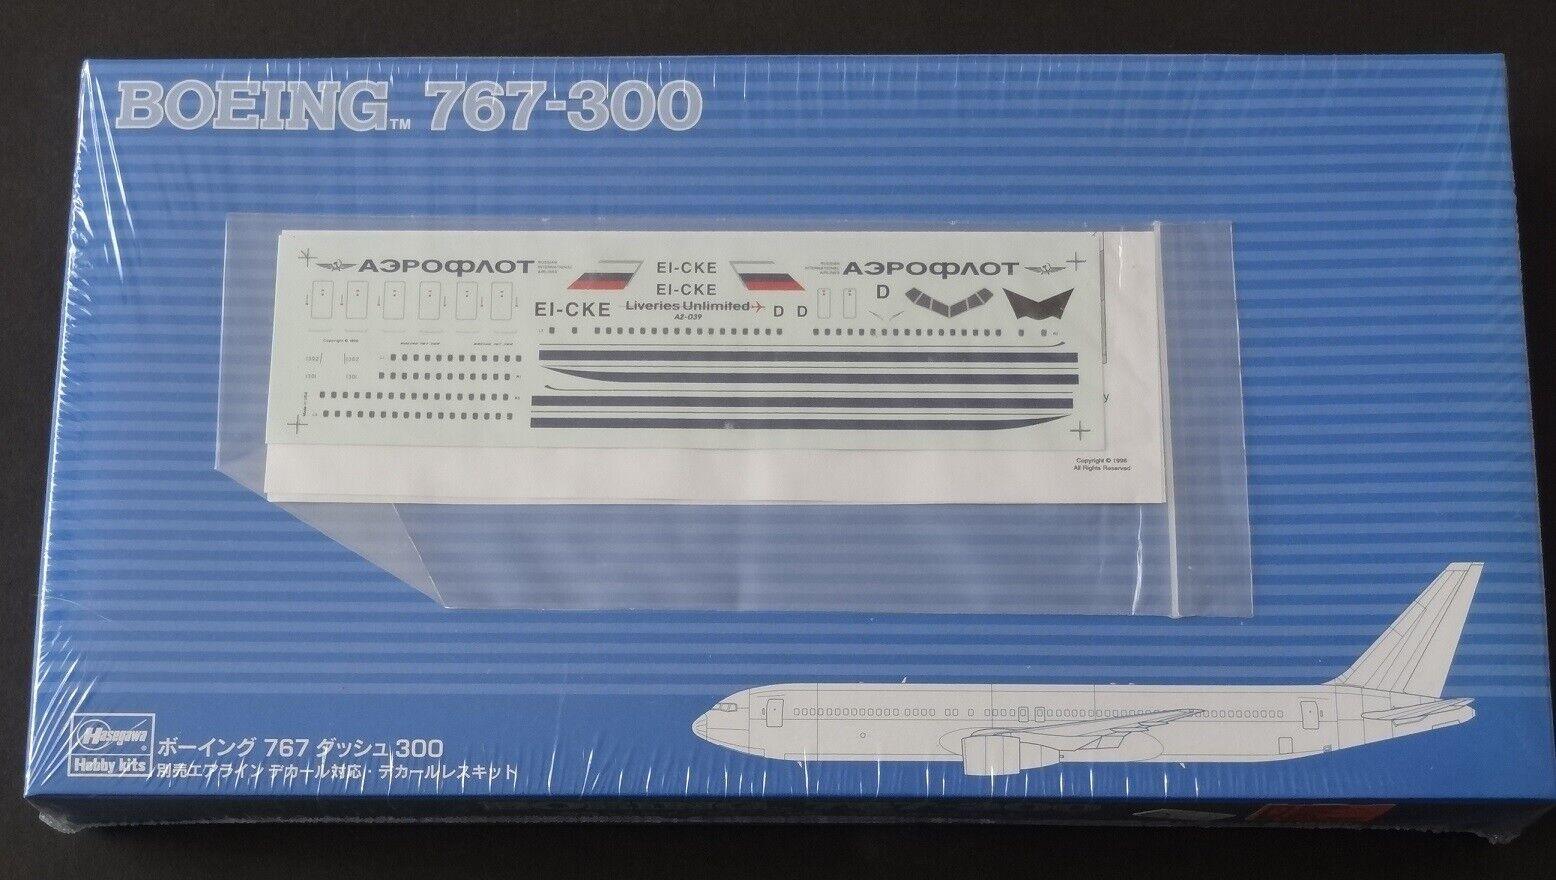 Hasegawa 1  200 BOEING 767 -300 Aeroflot  Liveries Unbegränsad Decal \\35;SP197